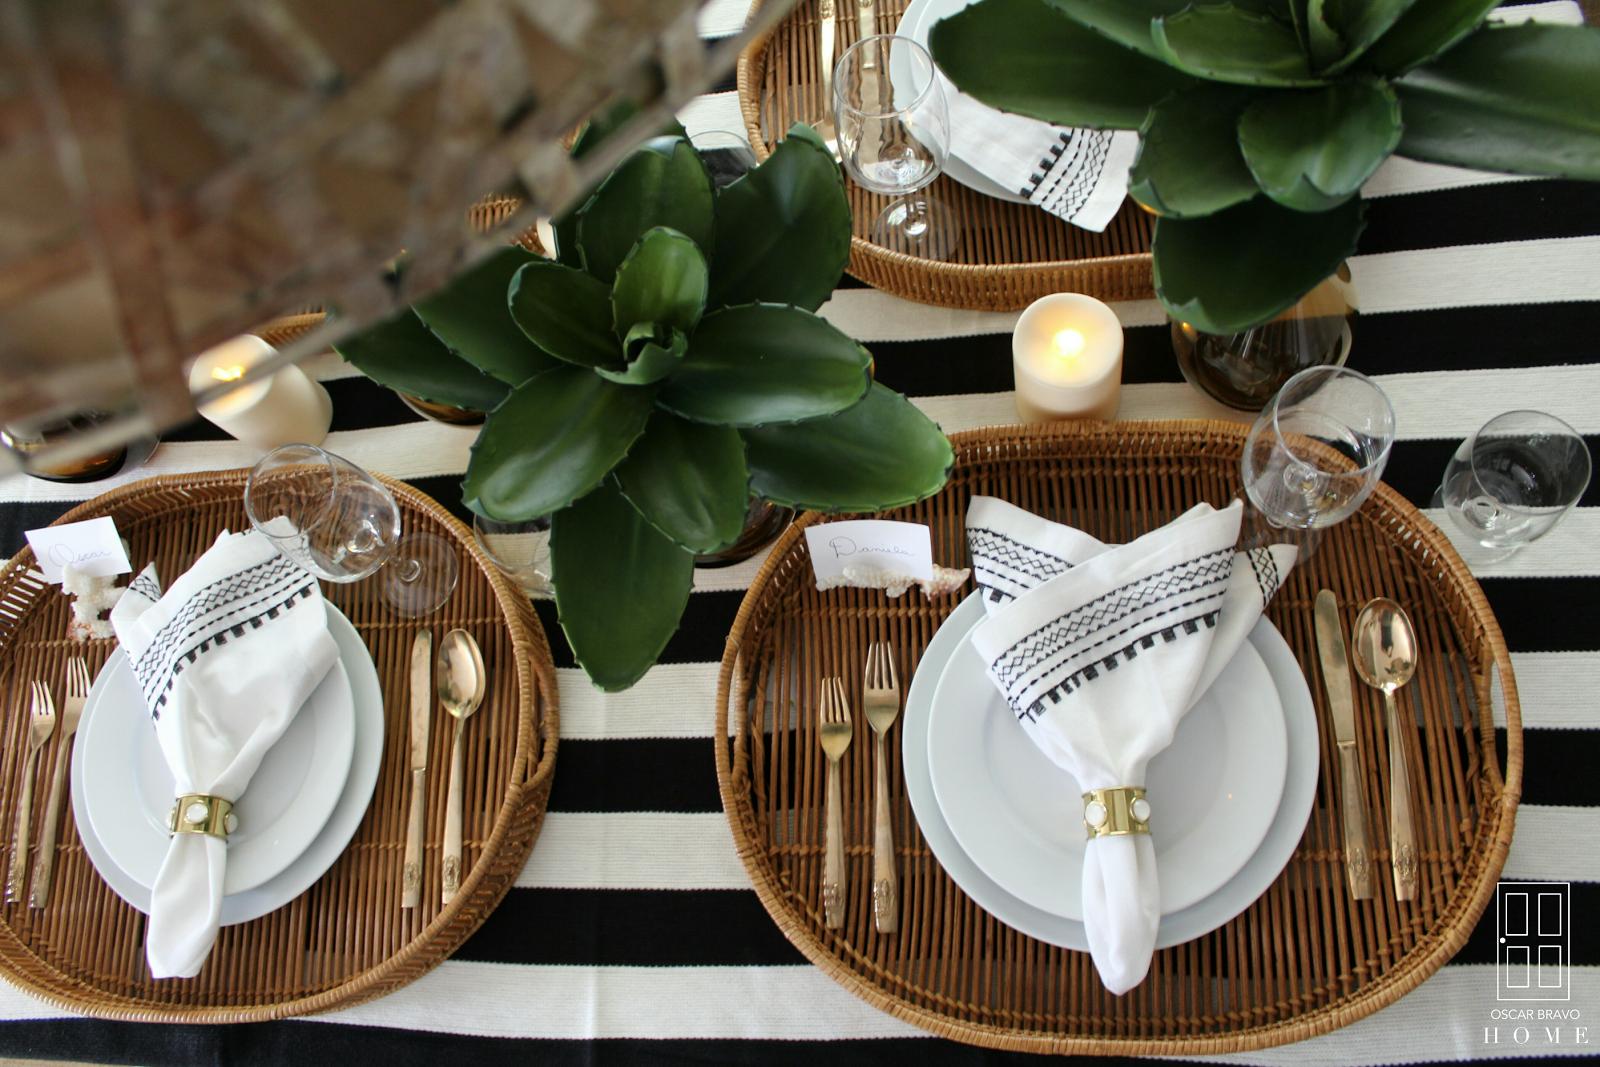 oscar bravo home: summer table setting